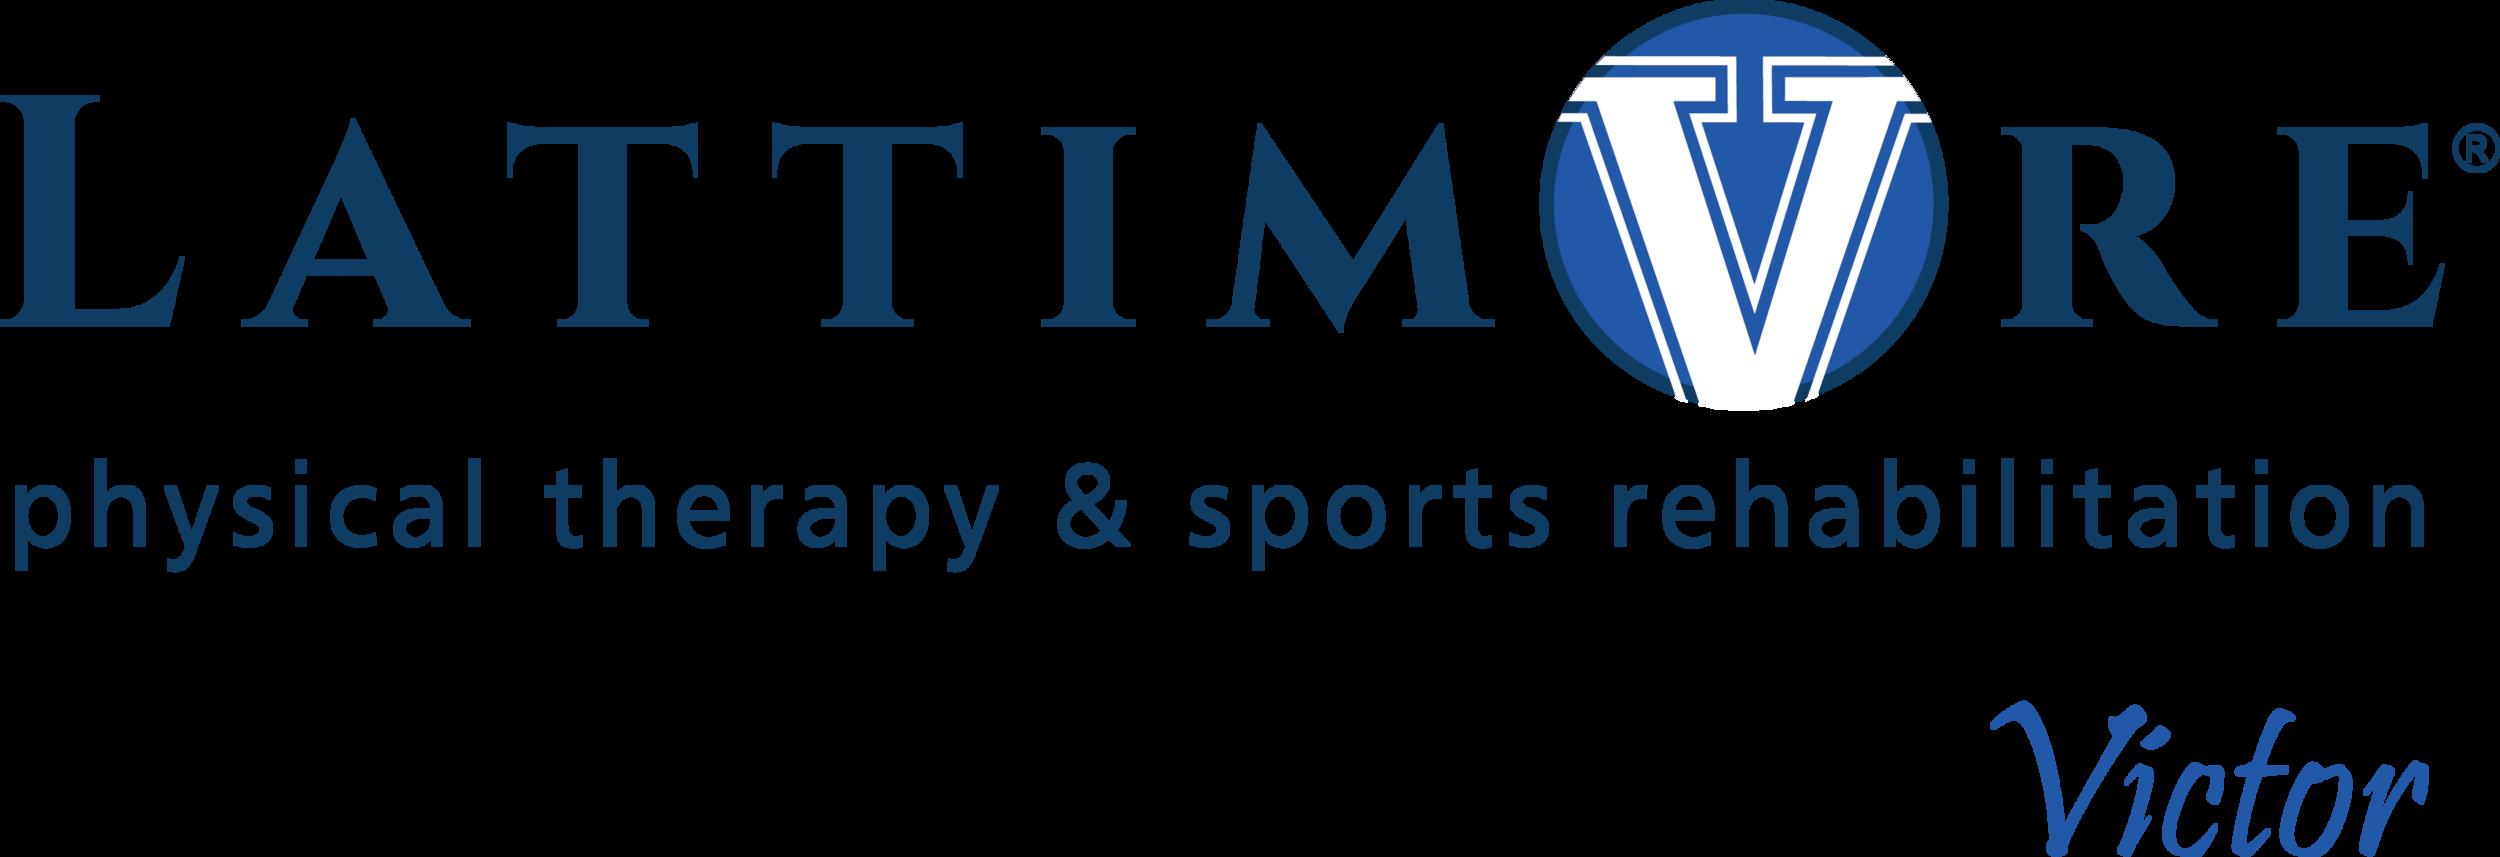 2019-05_Lattimore-Logo-Victor.png